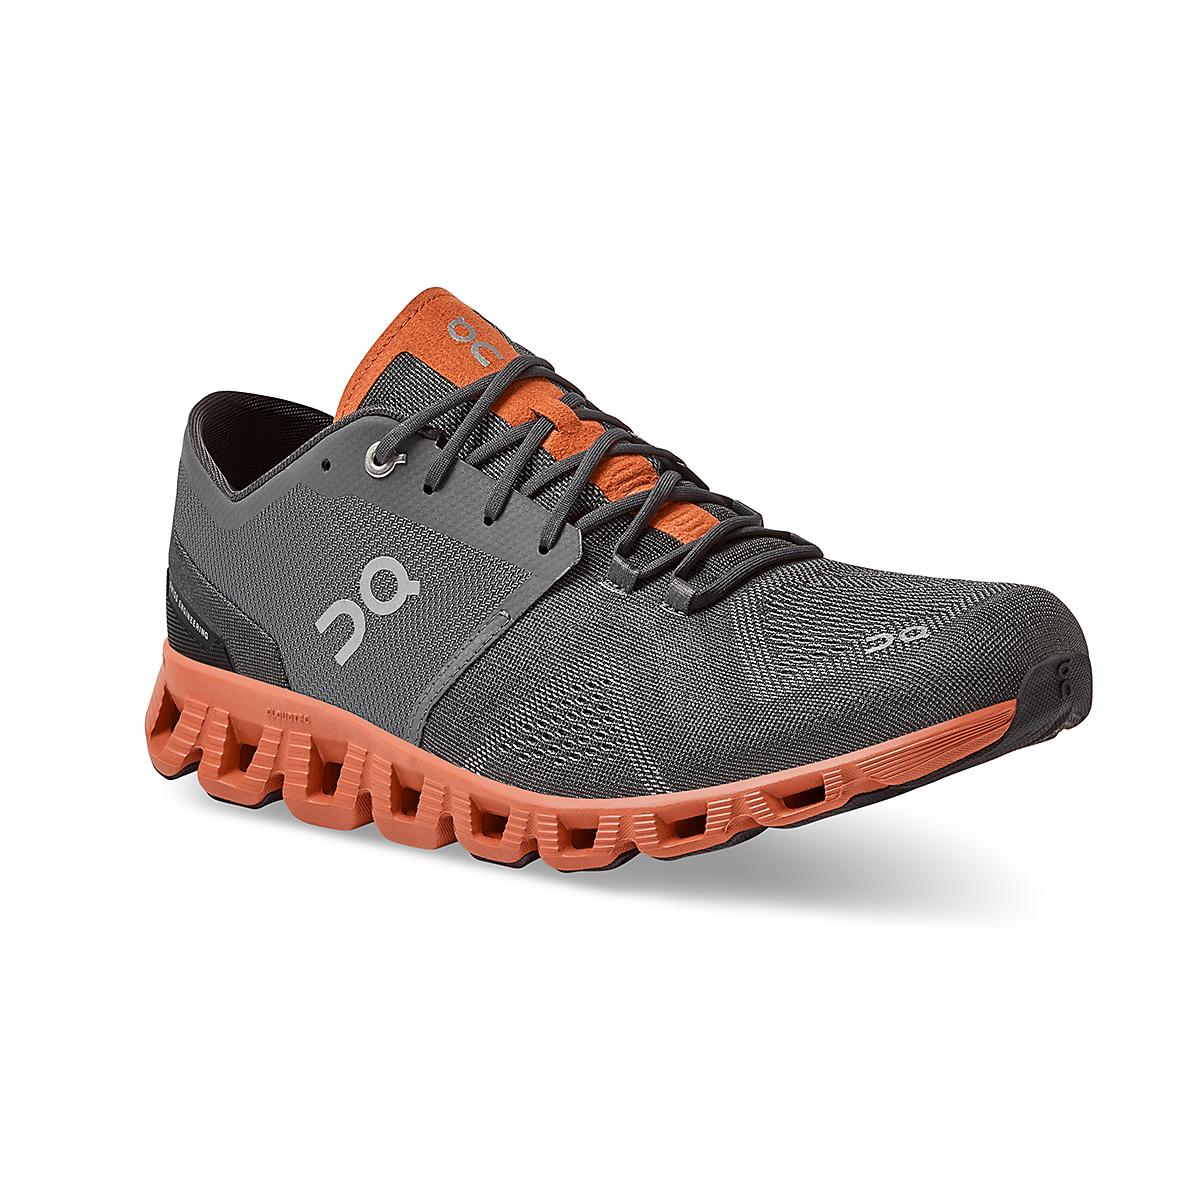 Men's On Cloud X 2.0 Training Shoe - Color: Rust/Rock - Size: 7 - Width: Regular, Rust/Rock, large, image 2